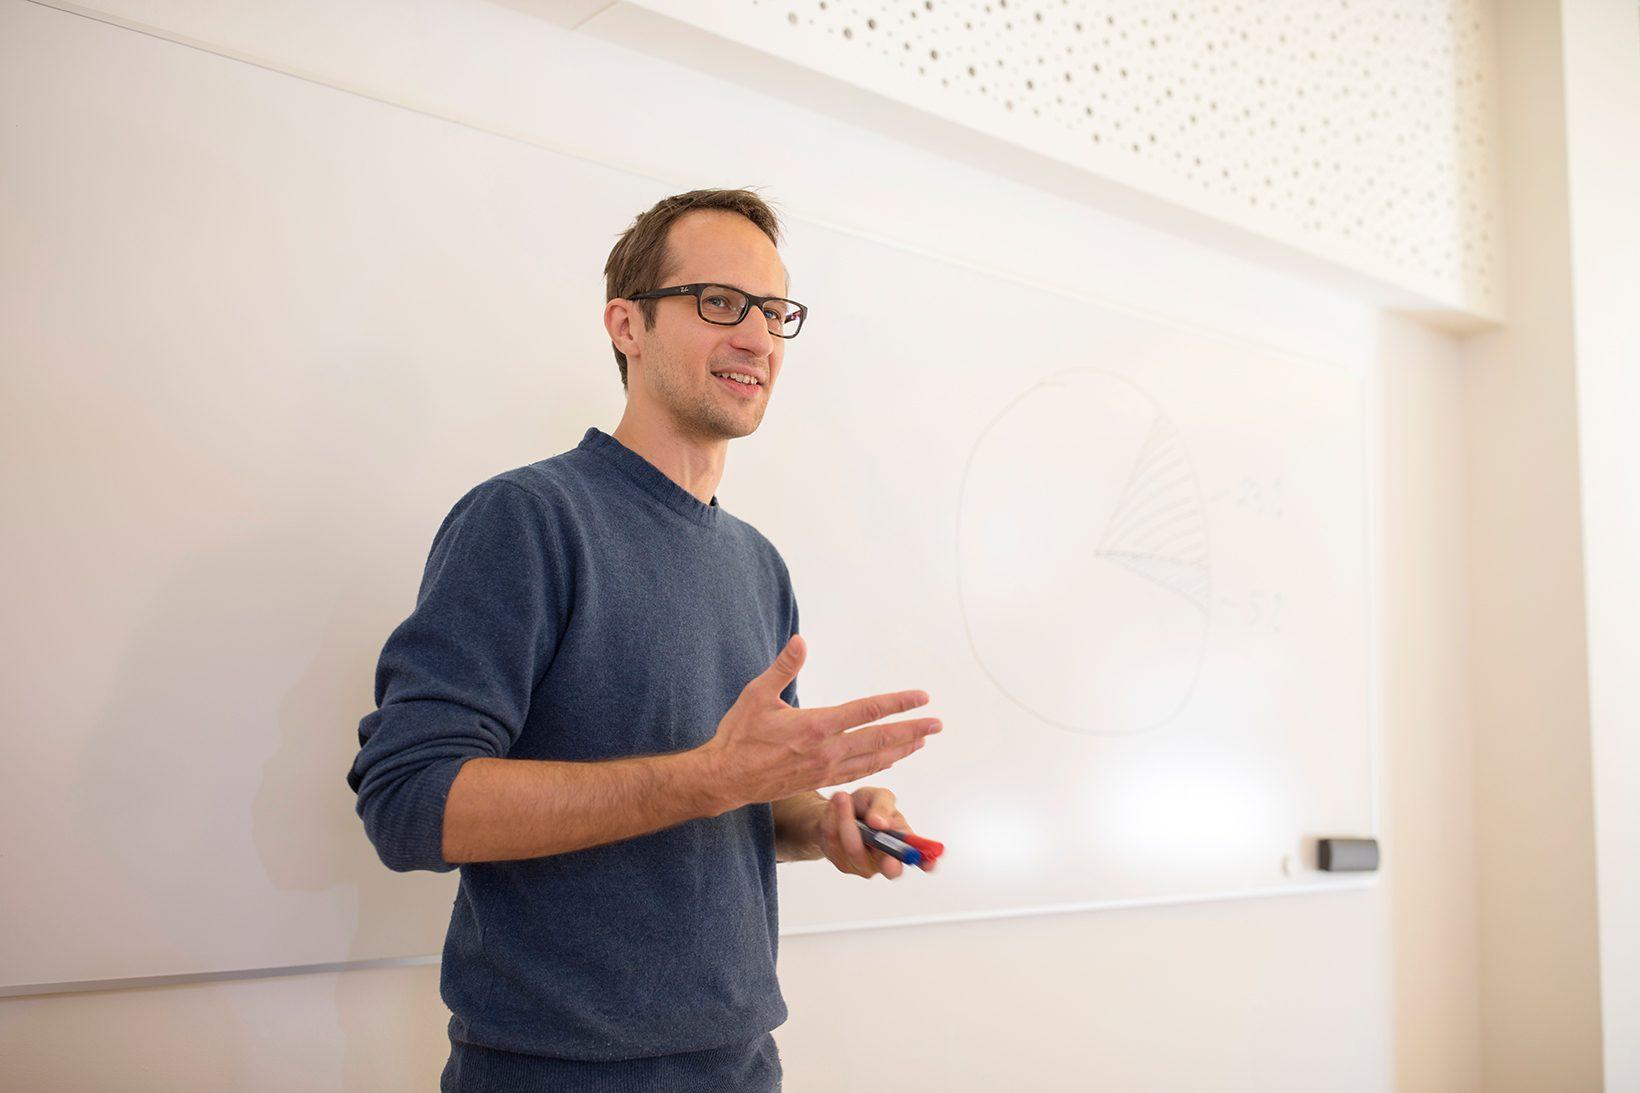 Gedankenaustausch (c) Raimo Rudi Rumpler